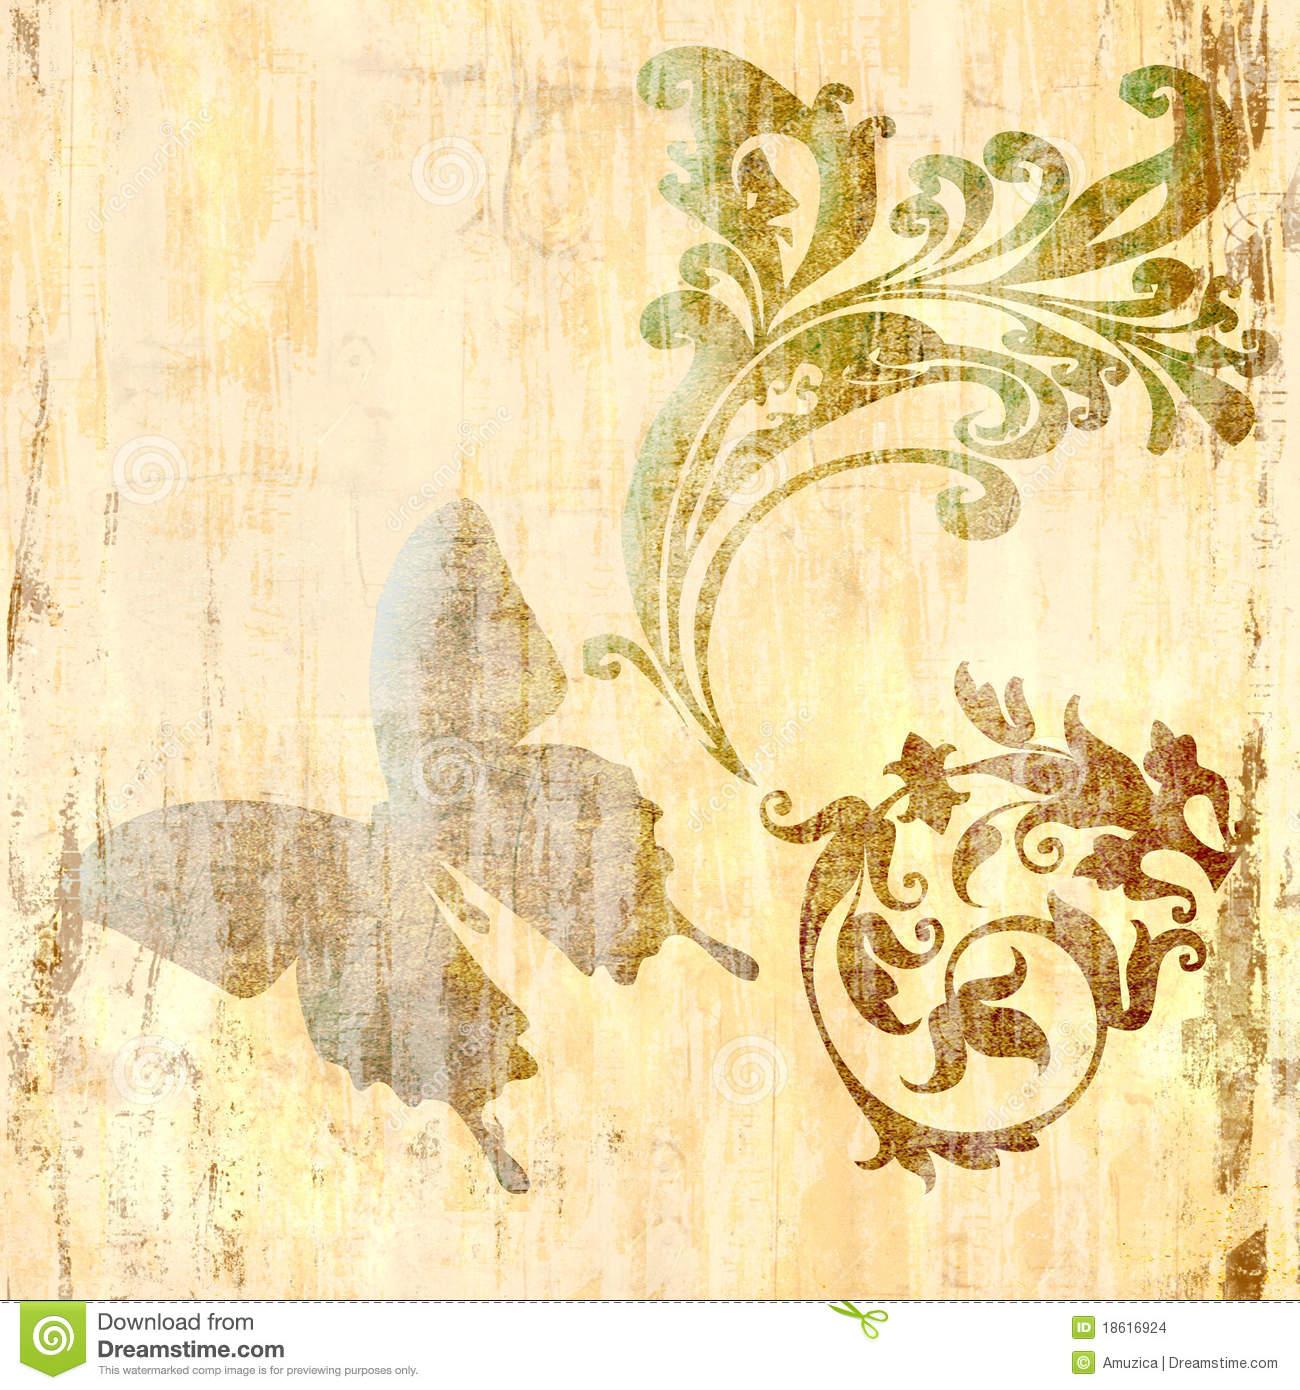 Vintage Butterfly Wallpaper   Widescreen HD Wallpapers 1300x1390